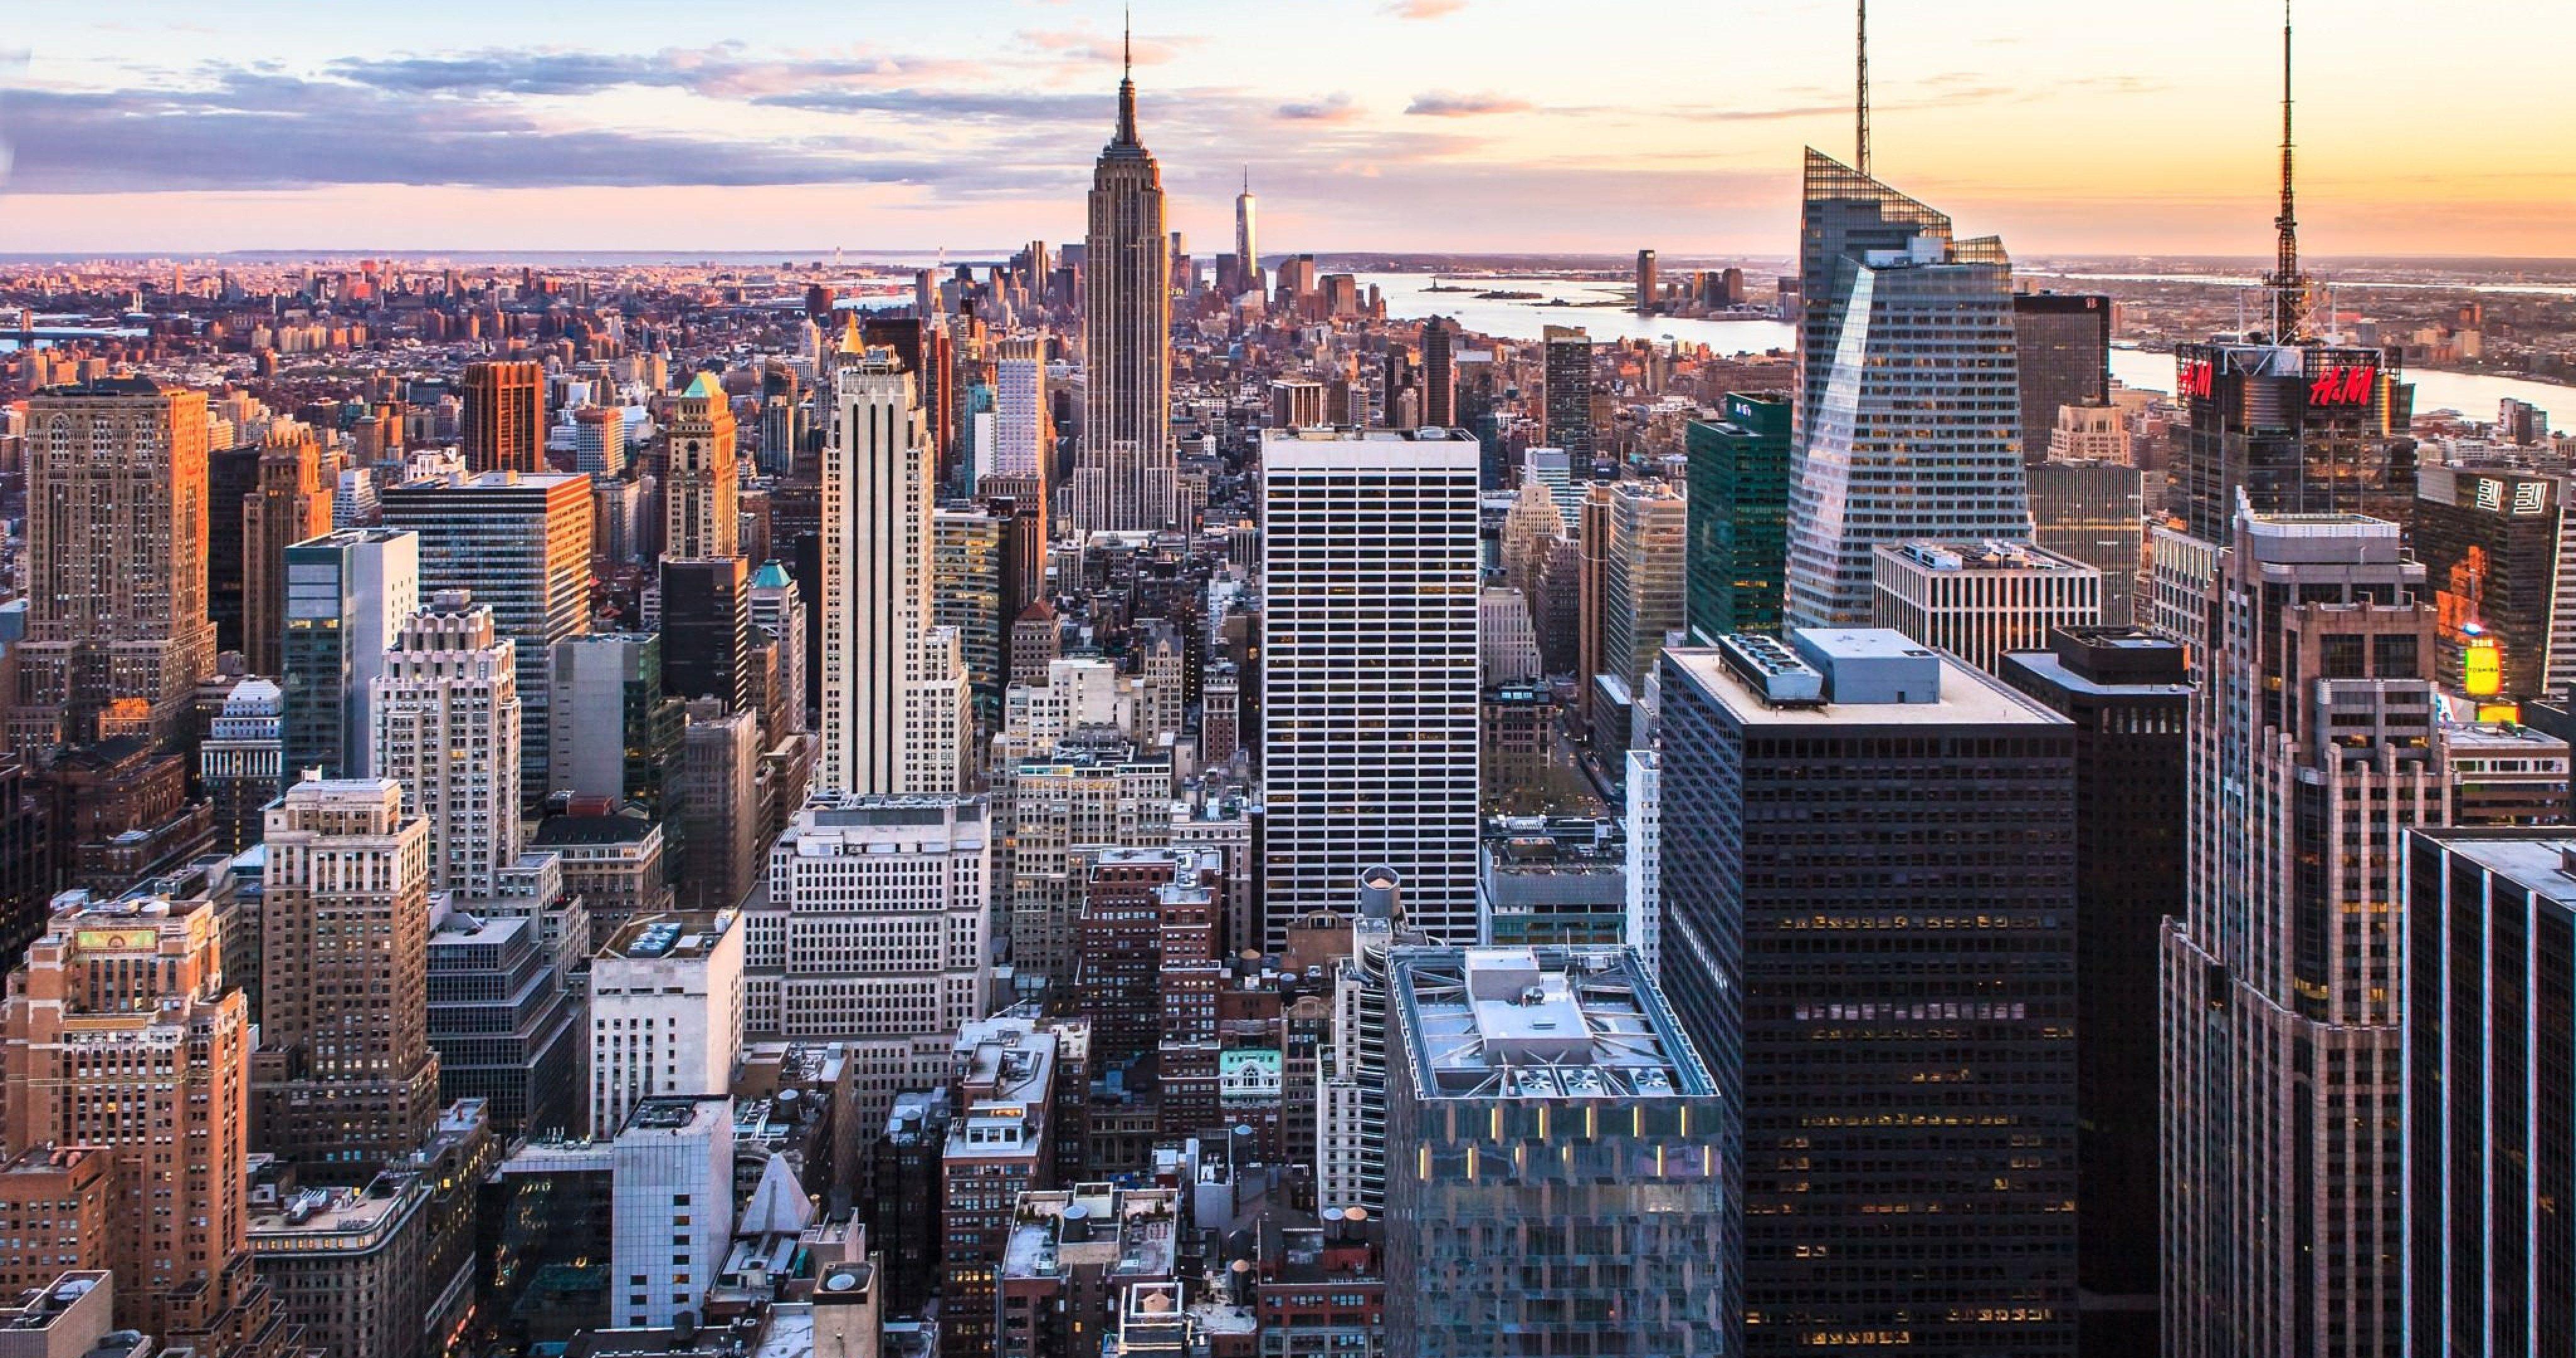 New York City Sunset Hd 4k Ultra Hd Wallpaper - New York City , HD Wallpaper & Backgrounds